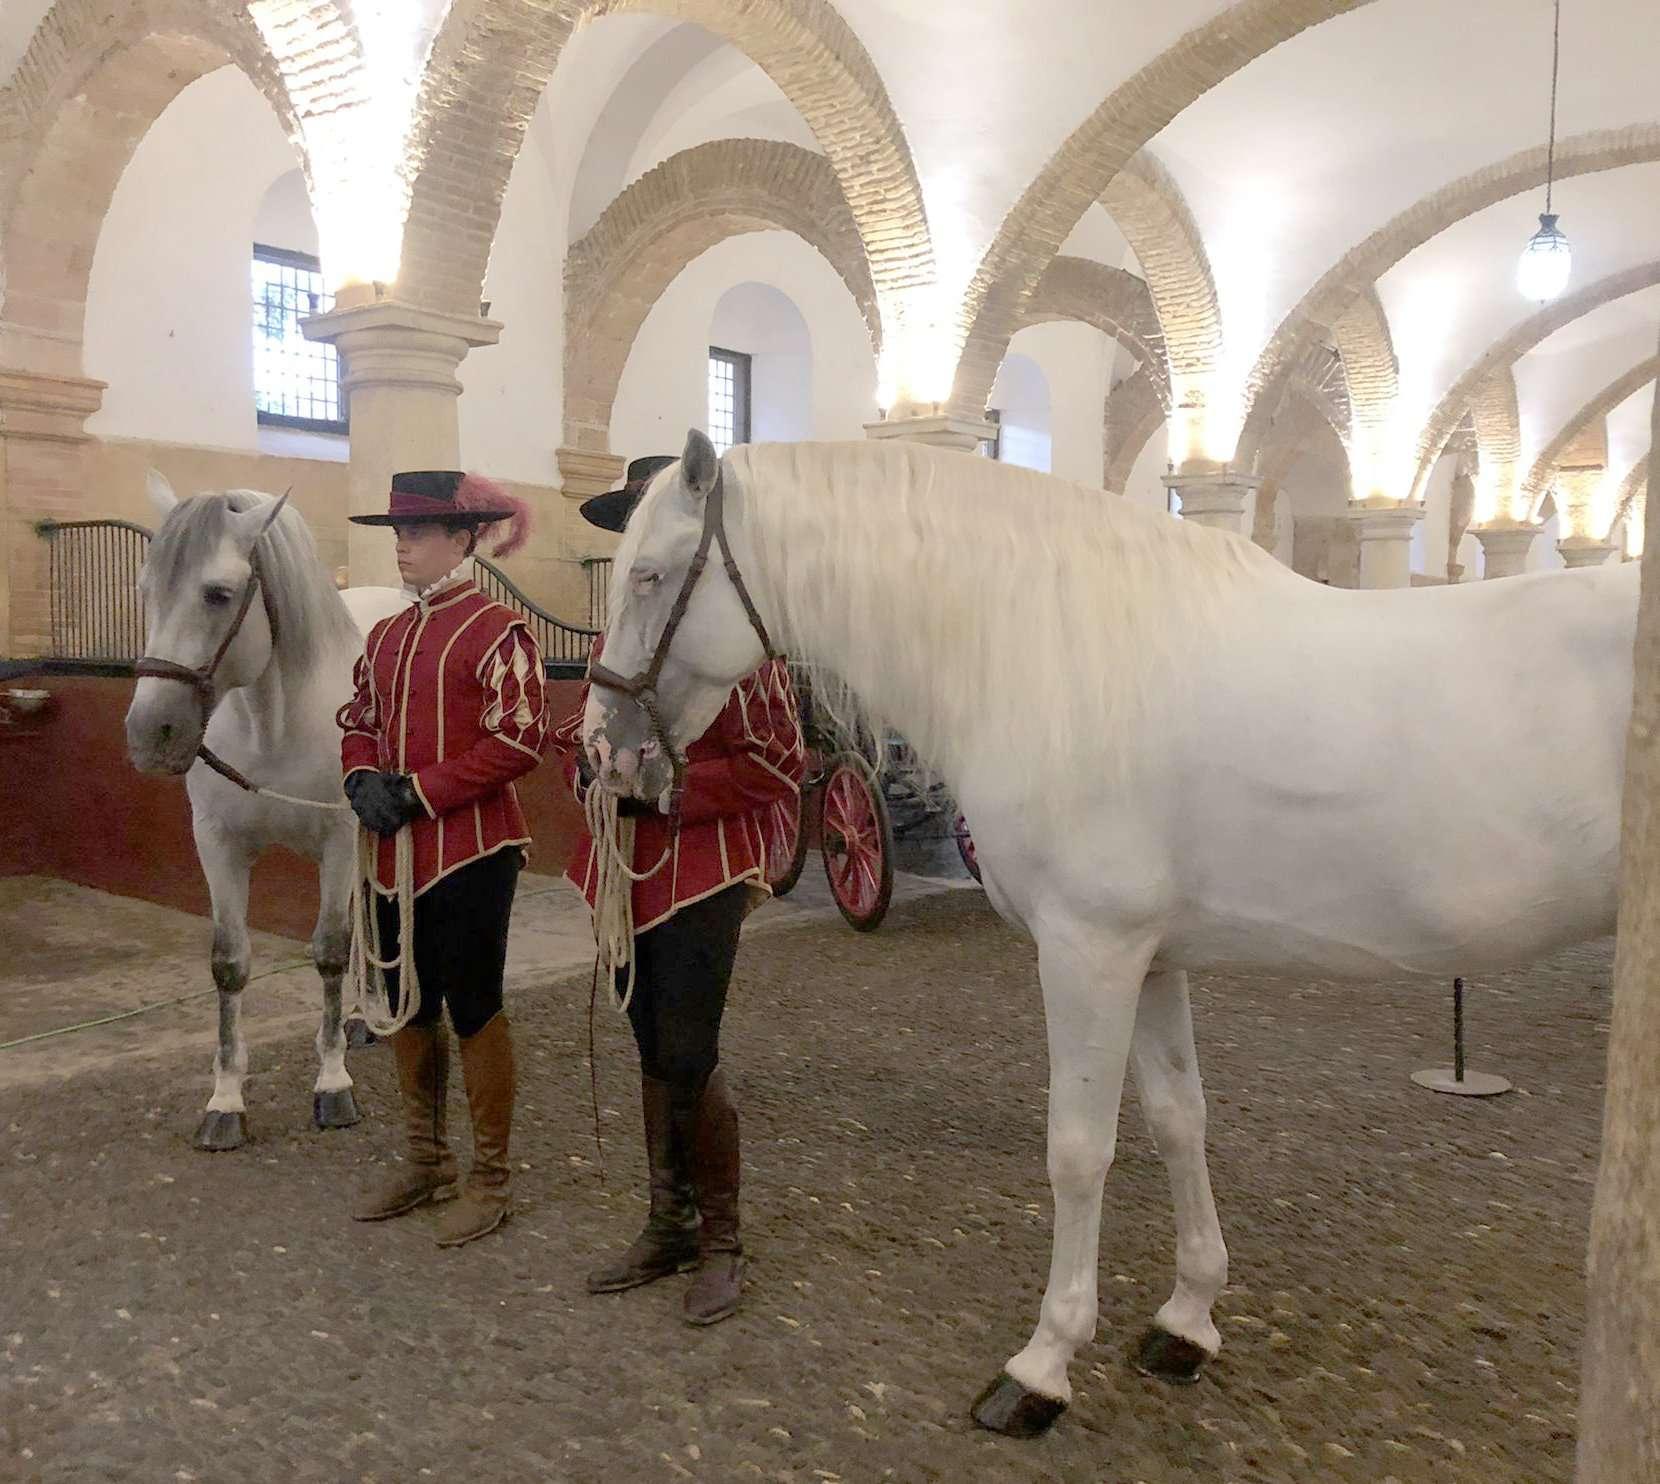 Córdoba Ecuestre ha conseguido dar luz de nuevo al mundo del caballo